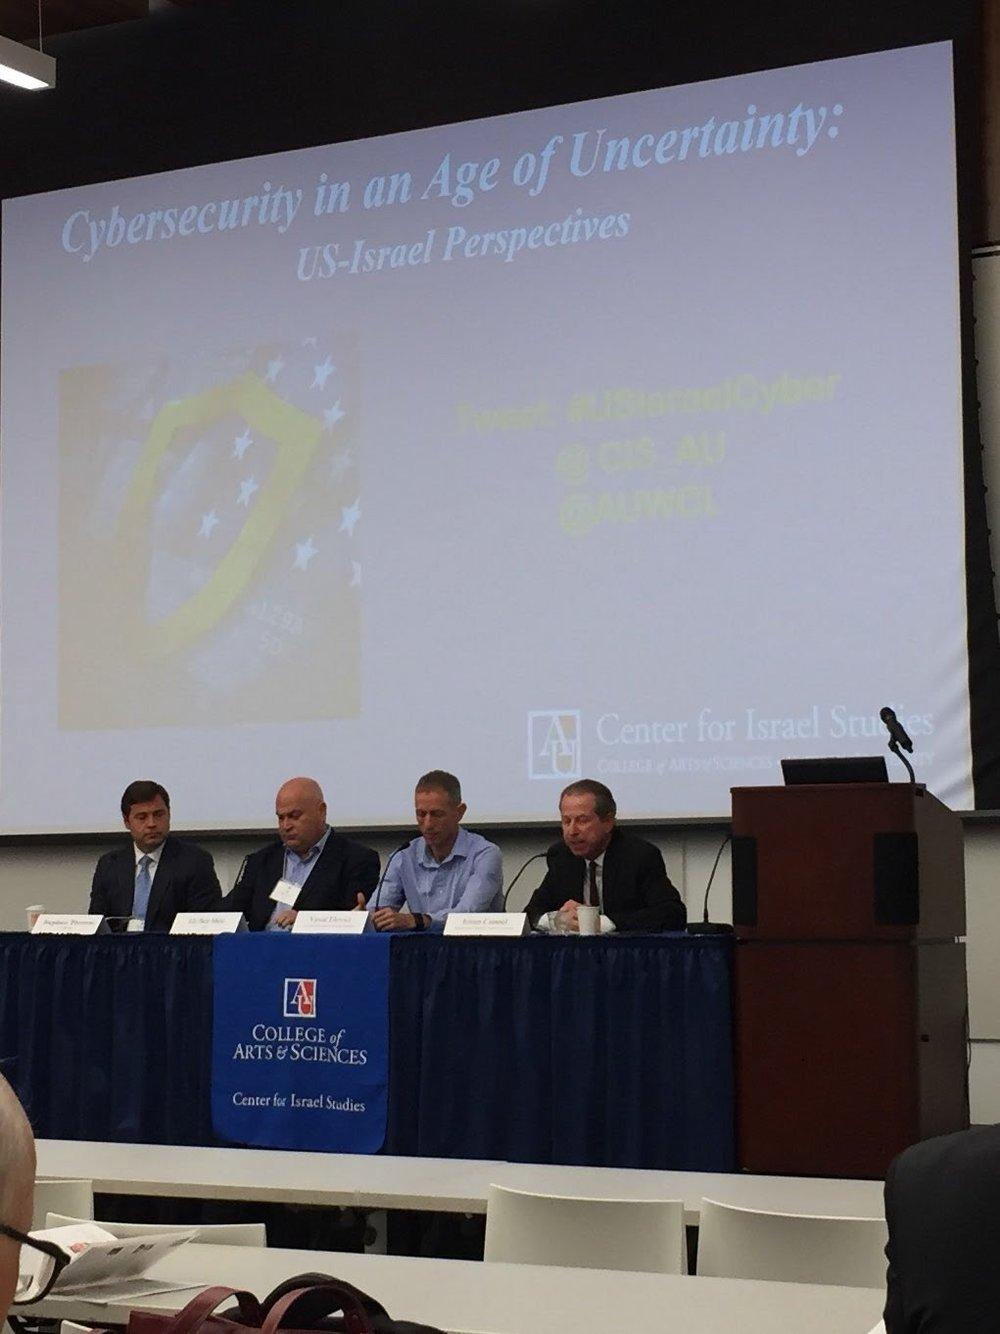 Left to right: Stephen Thomas, Eli Ben-Meir, Yuval Elovici, and professor Erran Carmel.